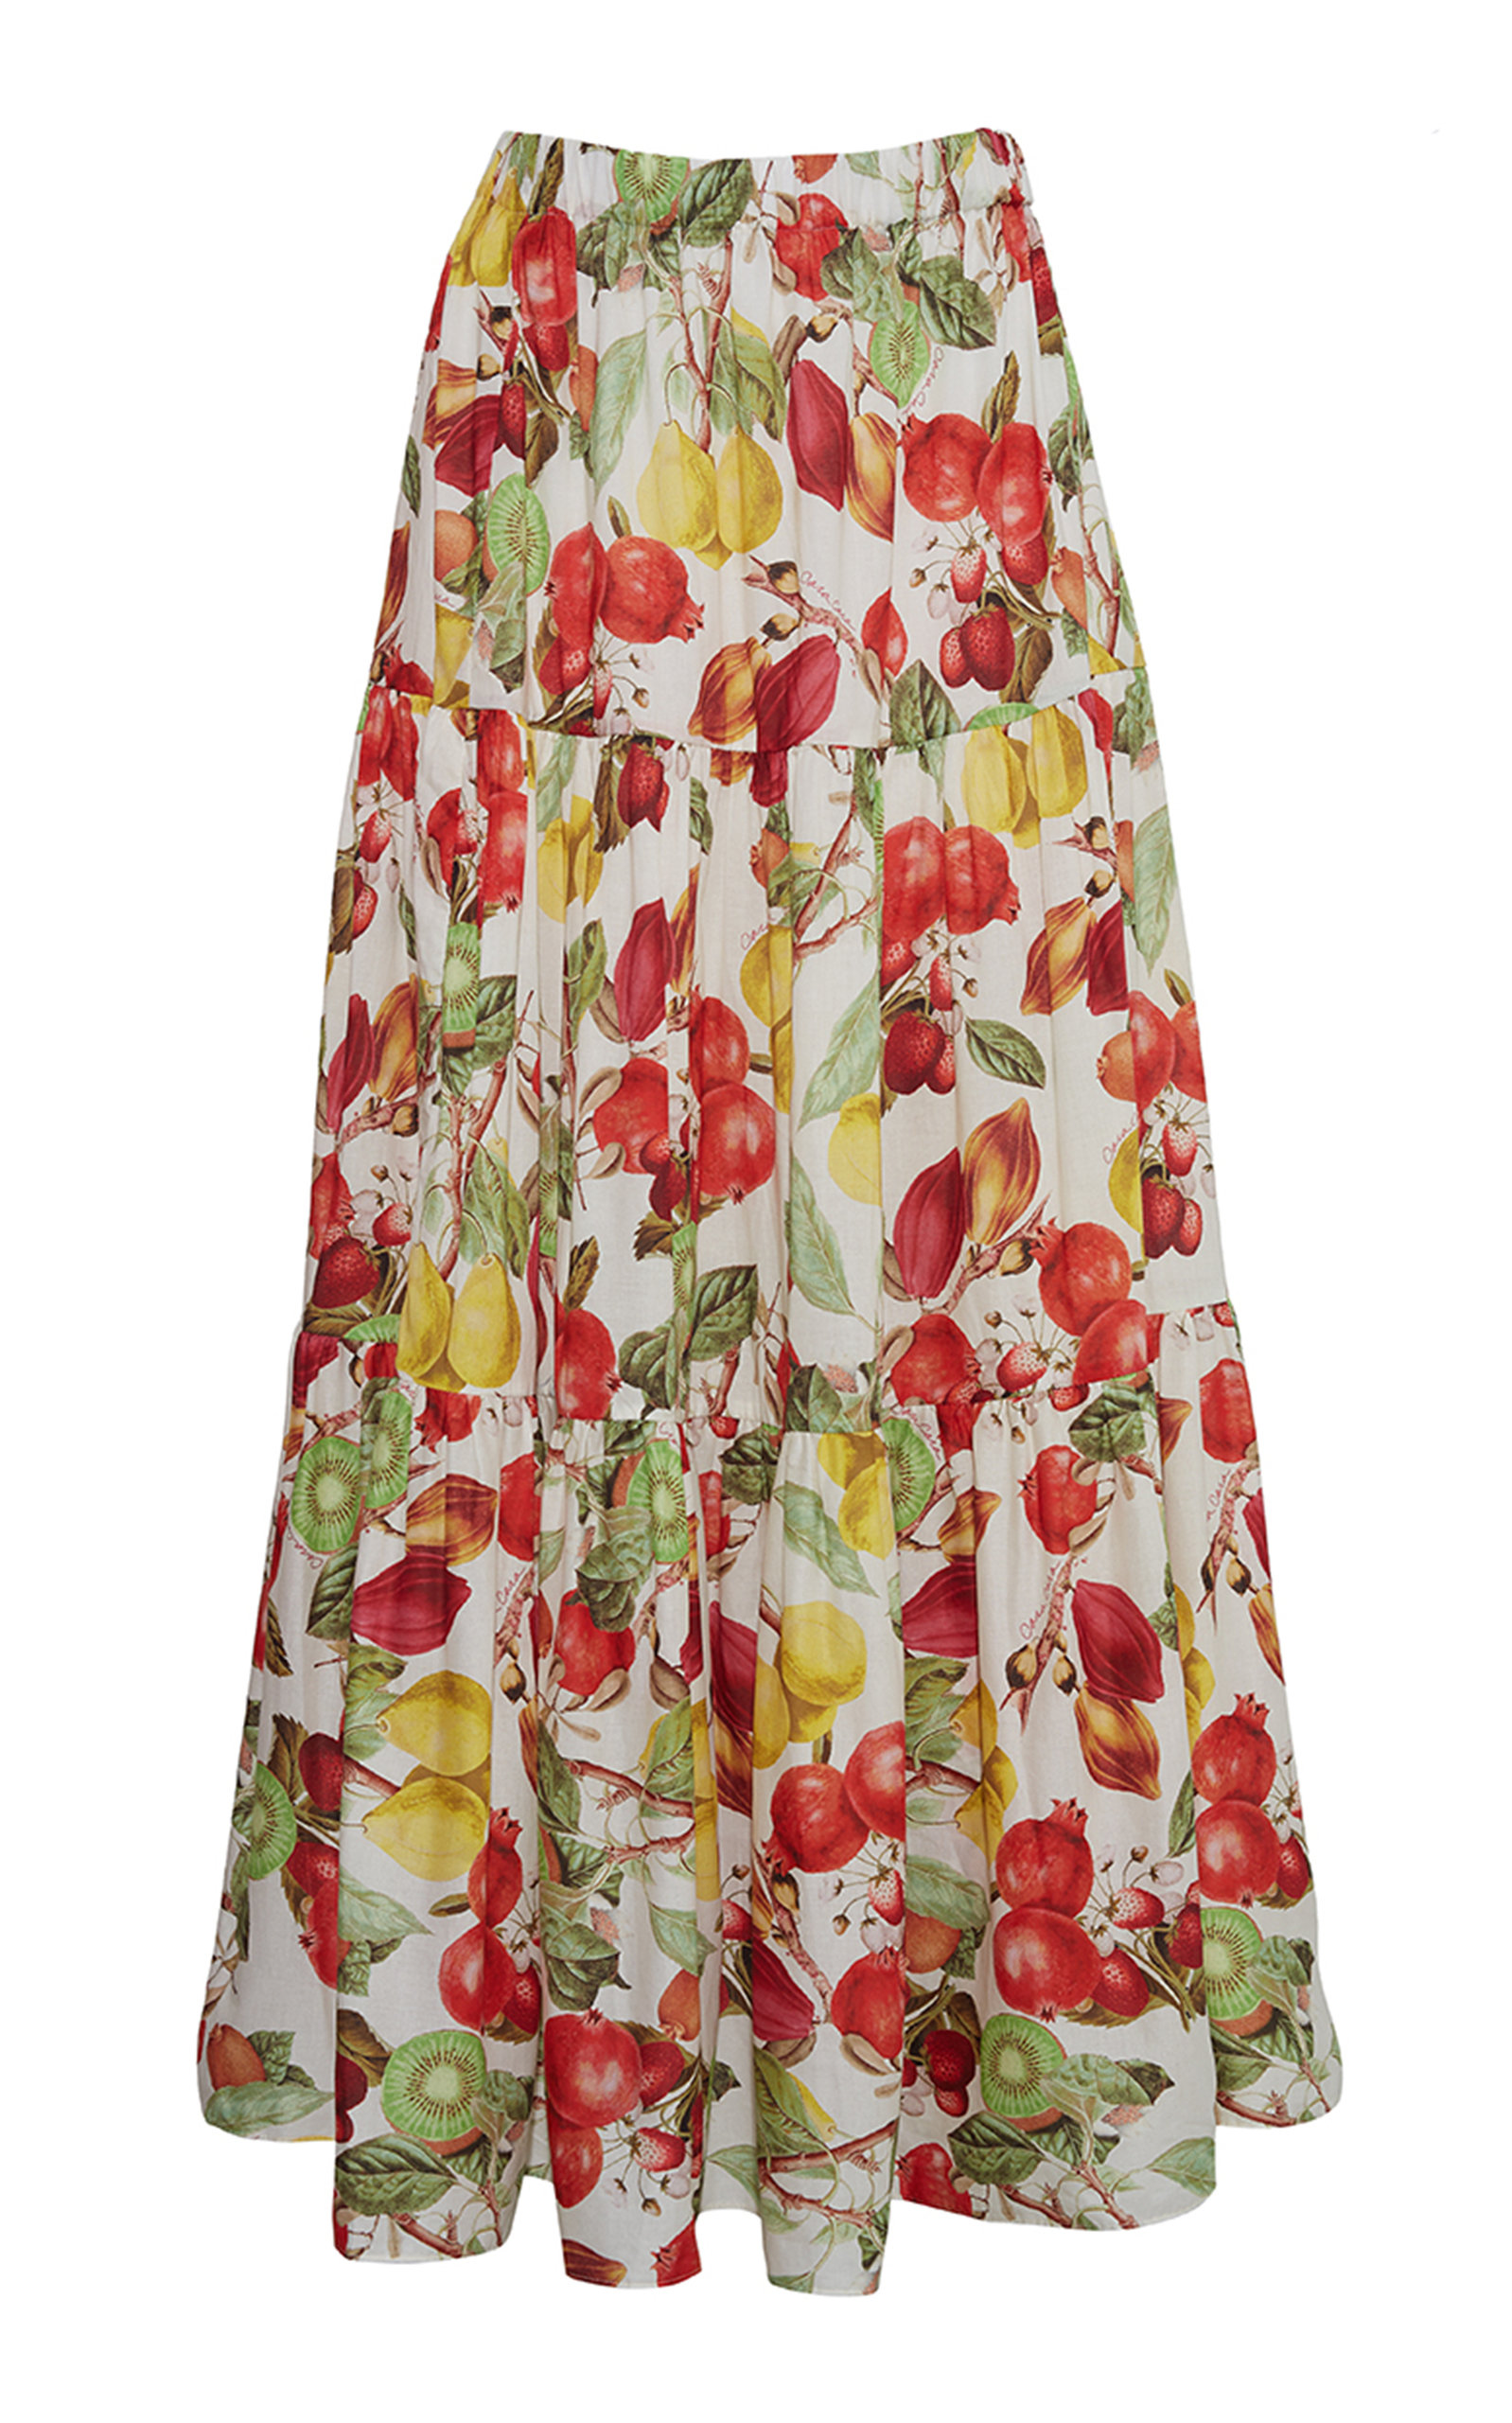 Women's Melanie Floral Voile Cotton Skirt